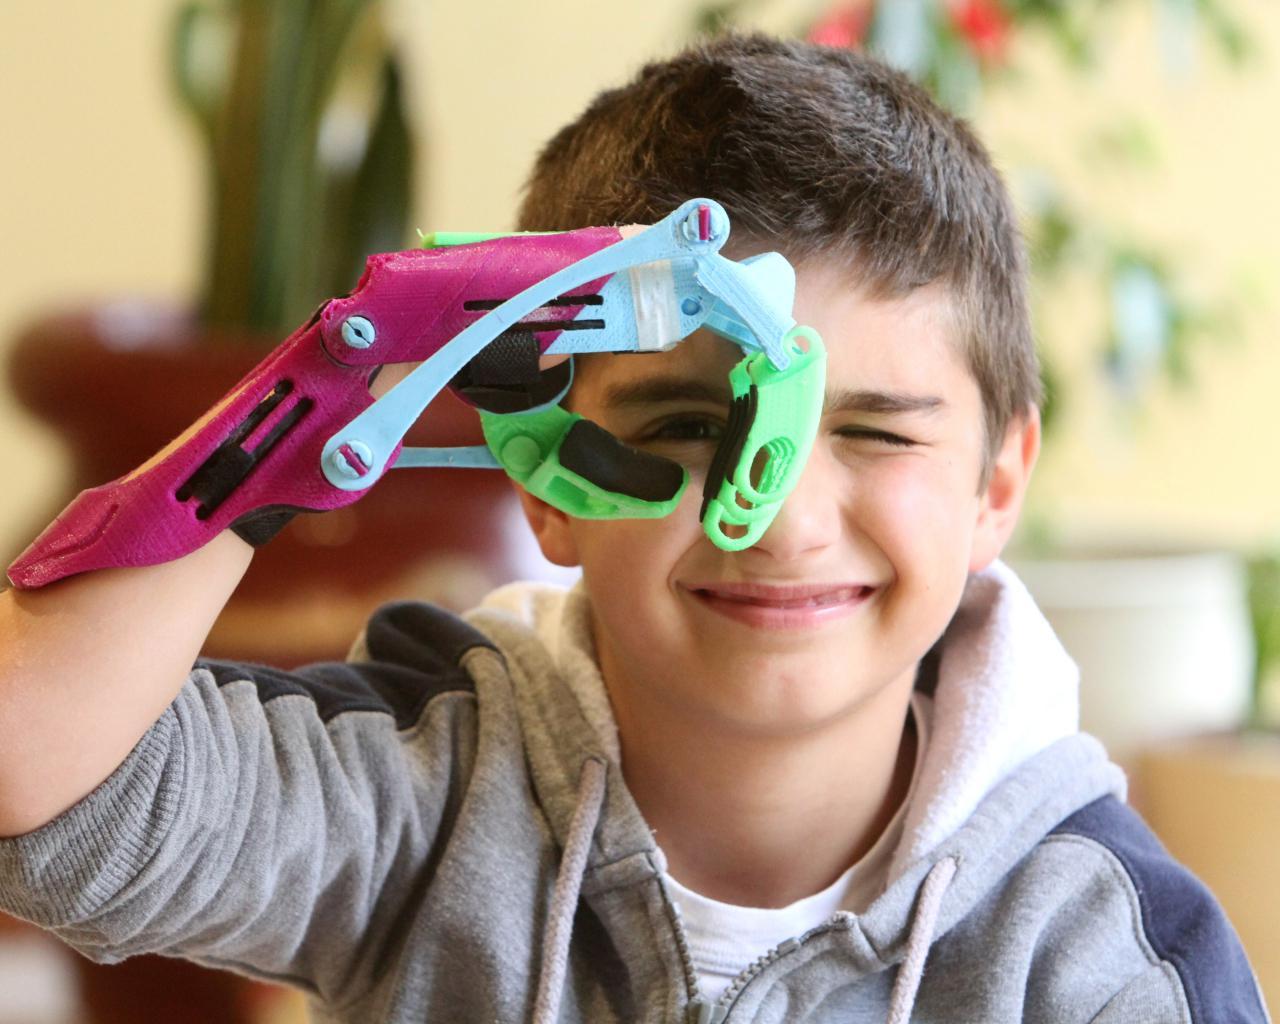 Limbs, el modelo 3D para ayudar a quien le falta una extremidad